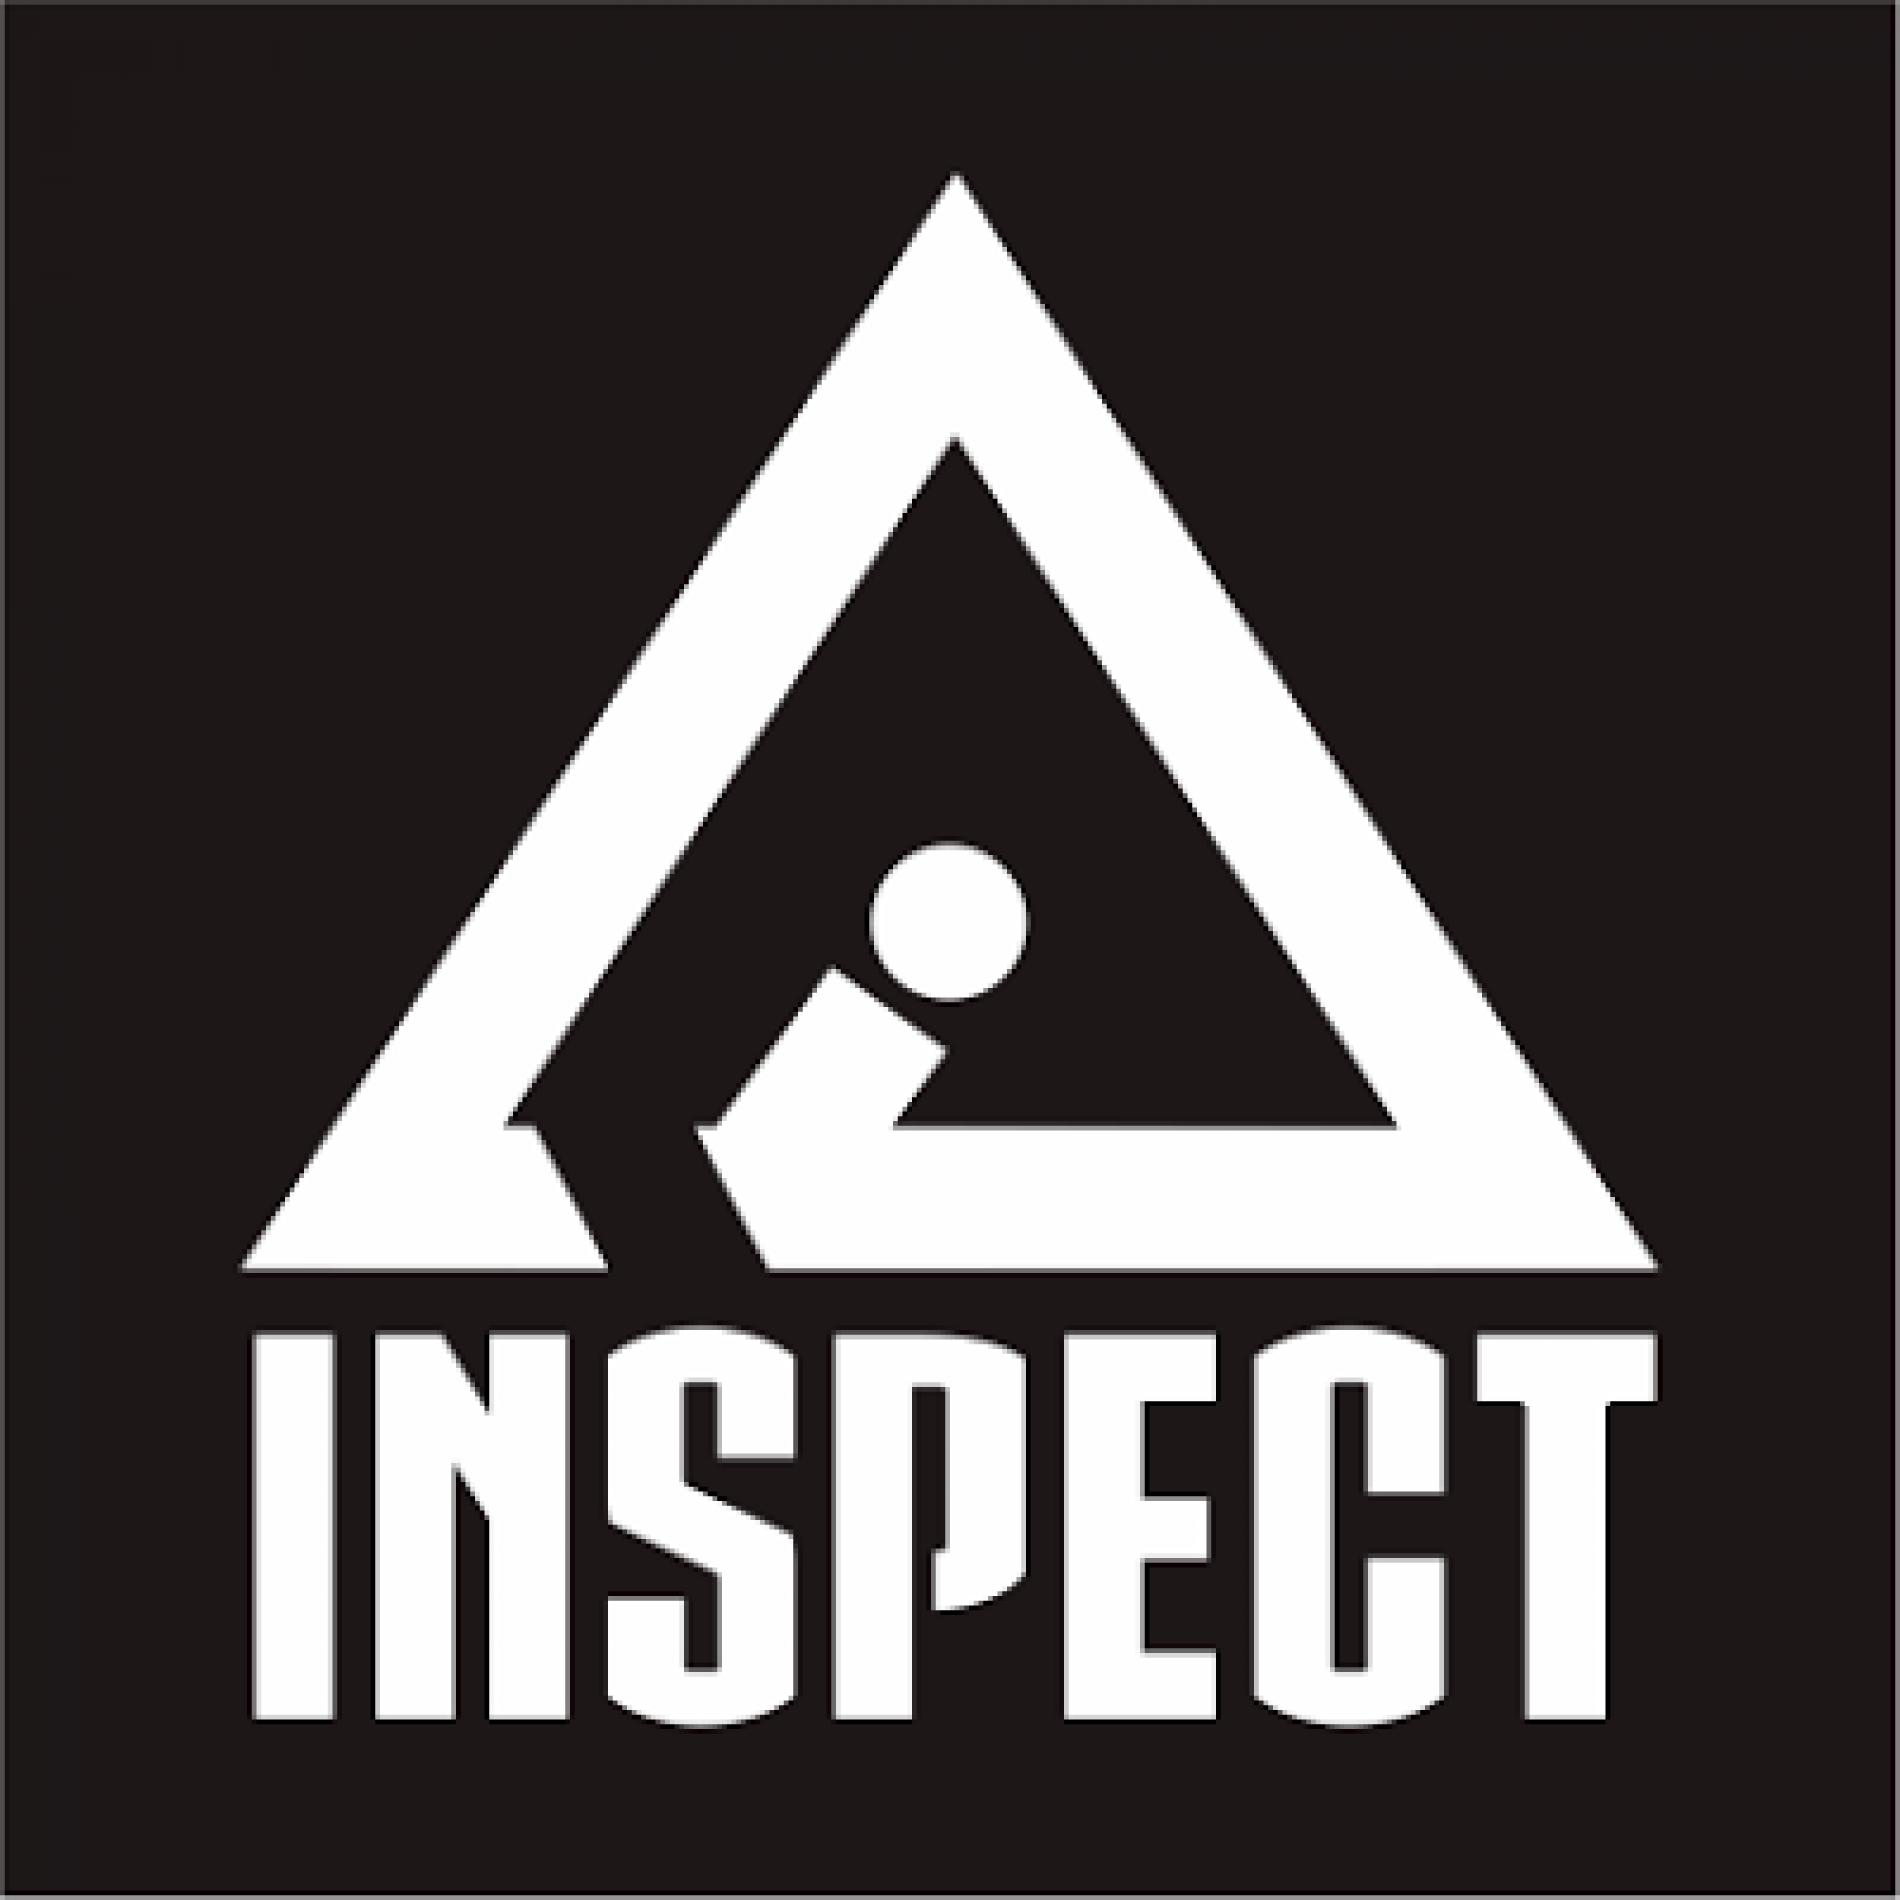 INSPECT Clothing rilis thsirt 28 oktober 2015